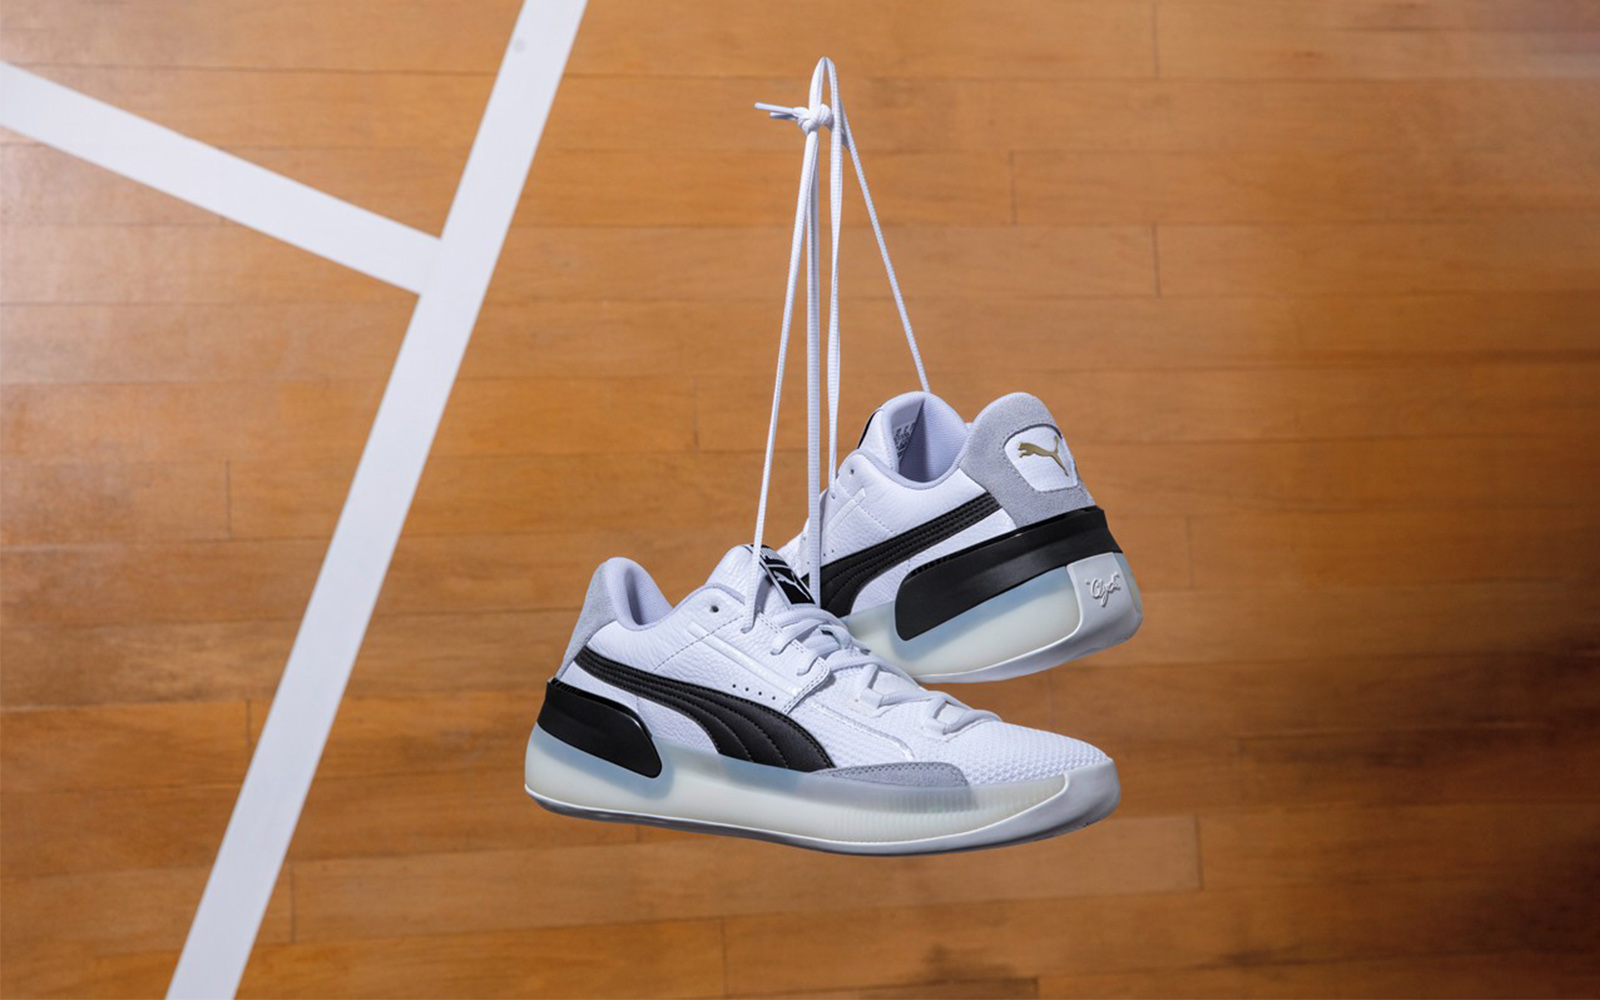 puma shoes latest design